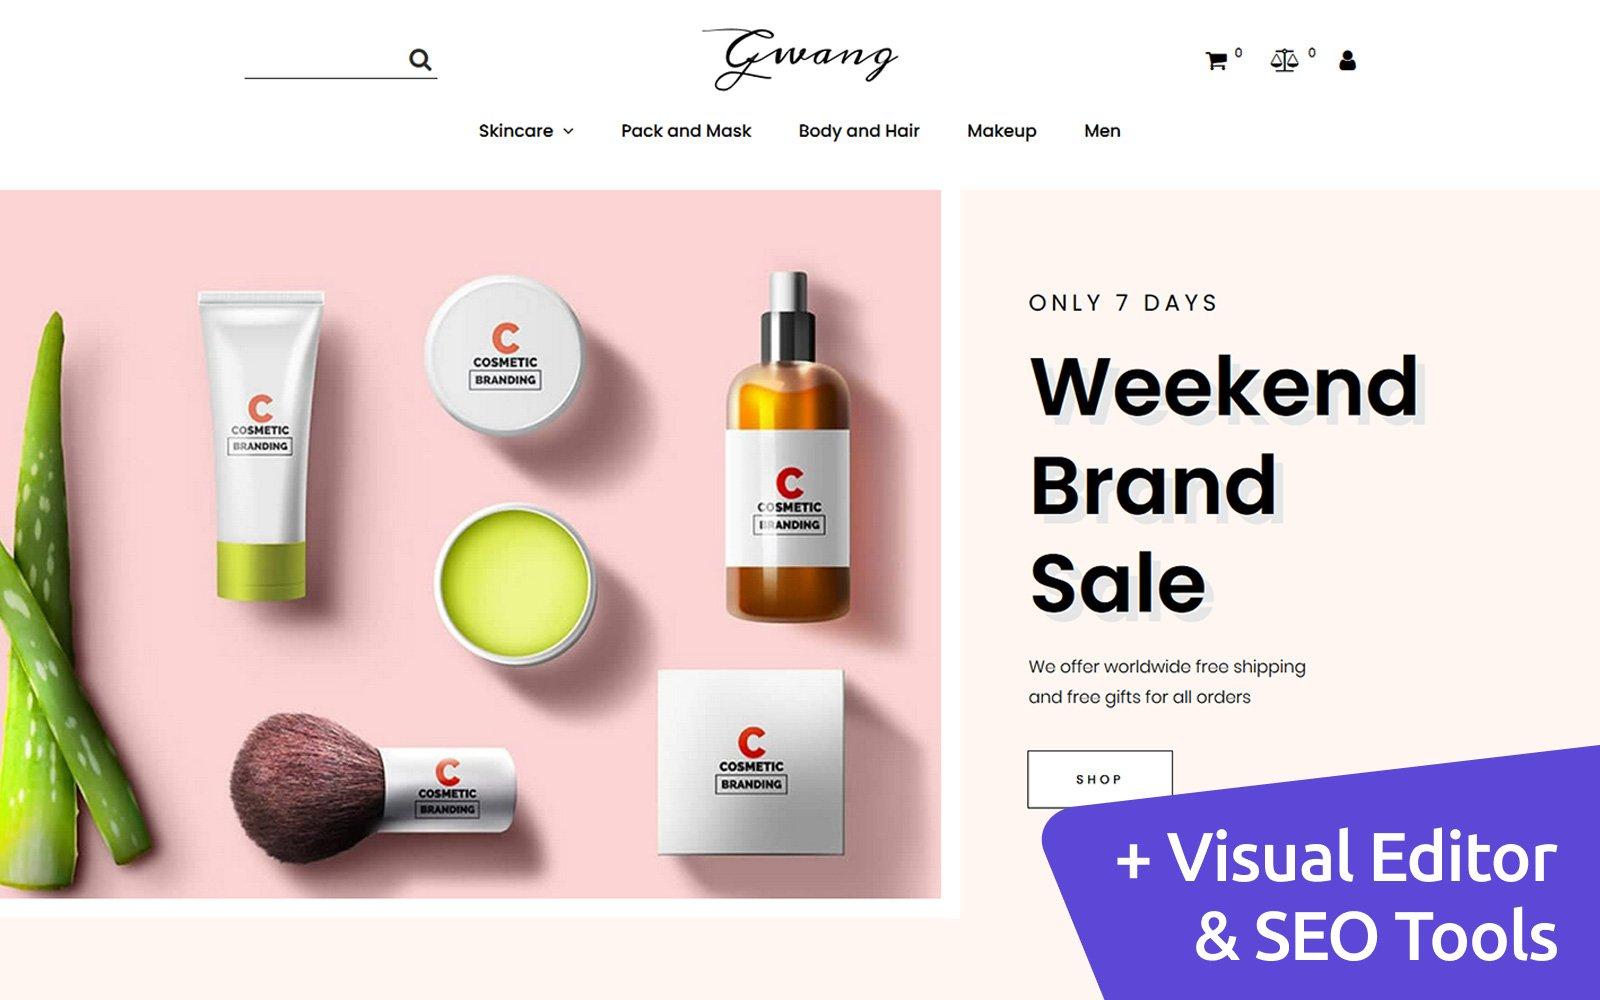 Gwang - Cosmetics Store MotoCMS Ecommerce Template